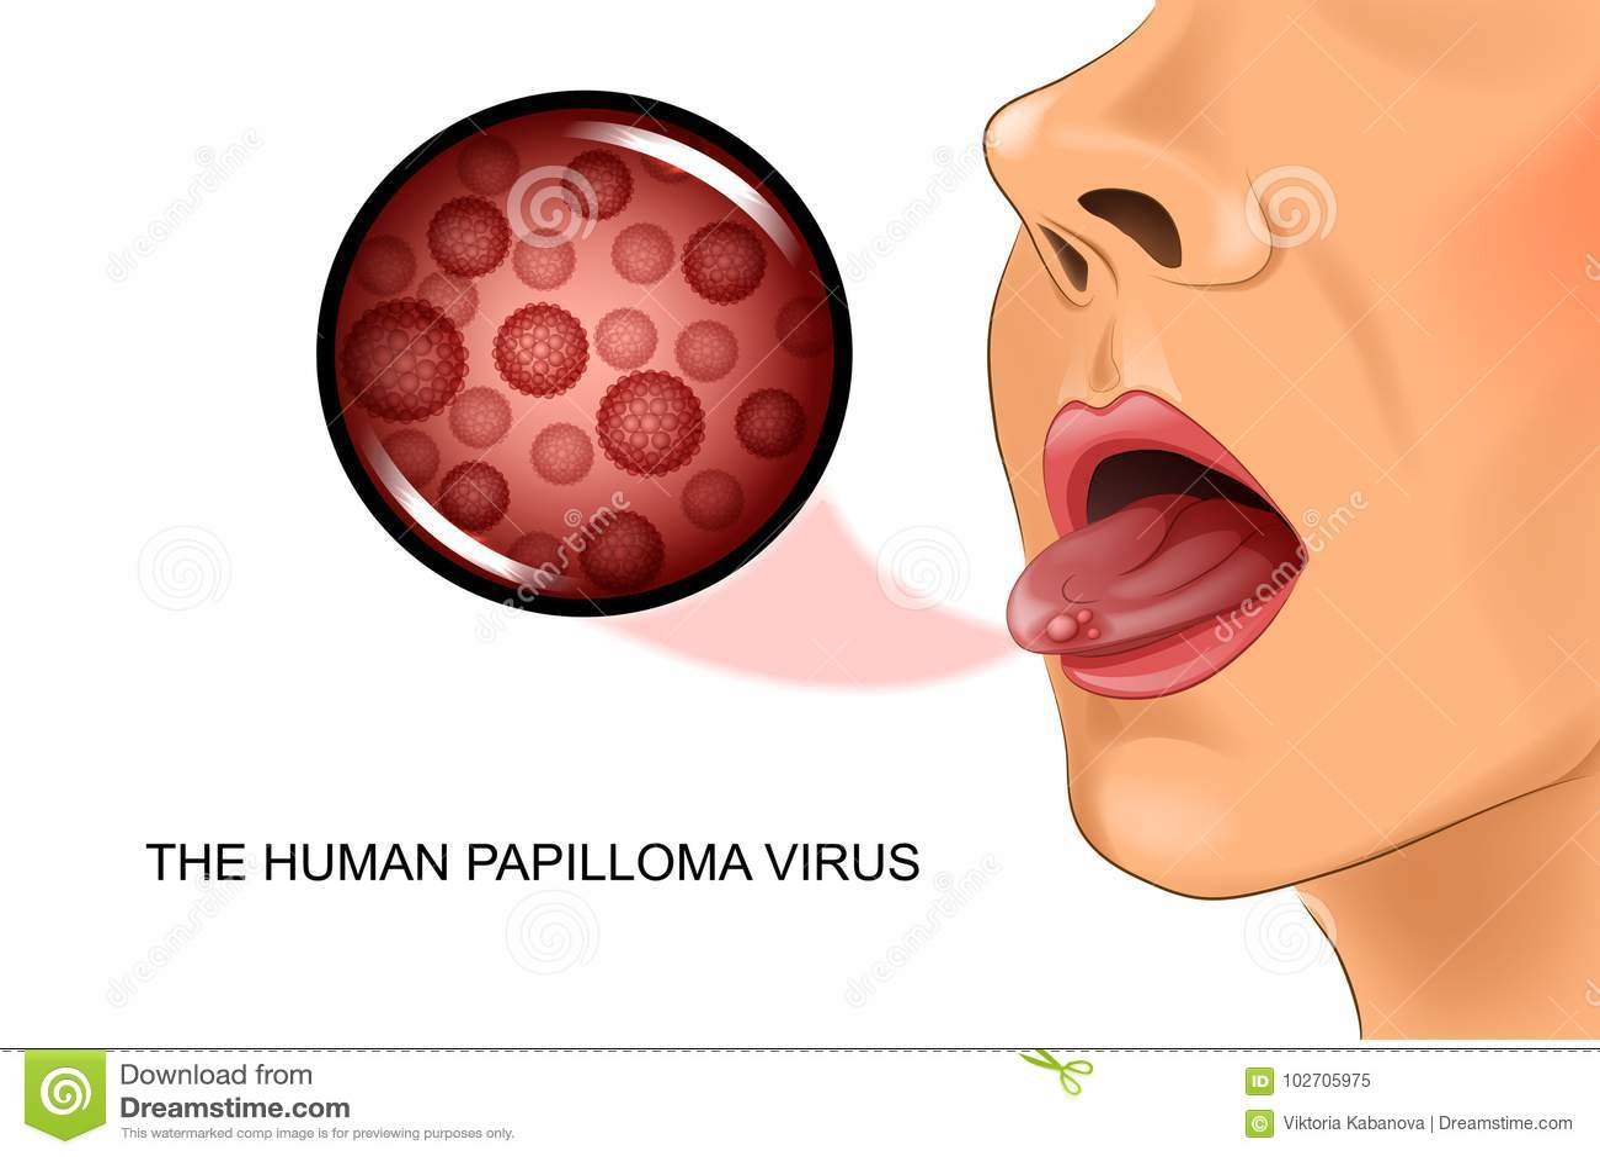 oxiuri complicatii manifestaciones del virus del papiloma humano en hombres